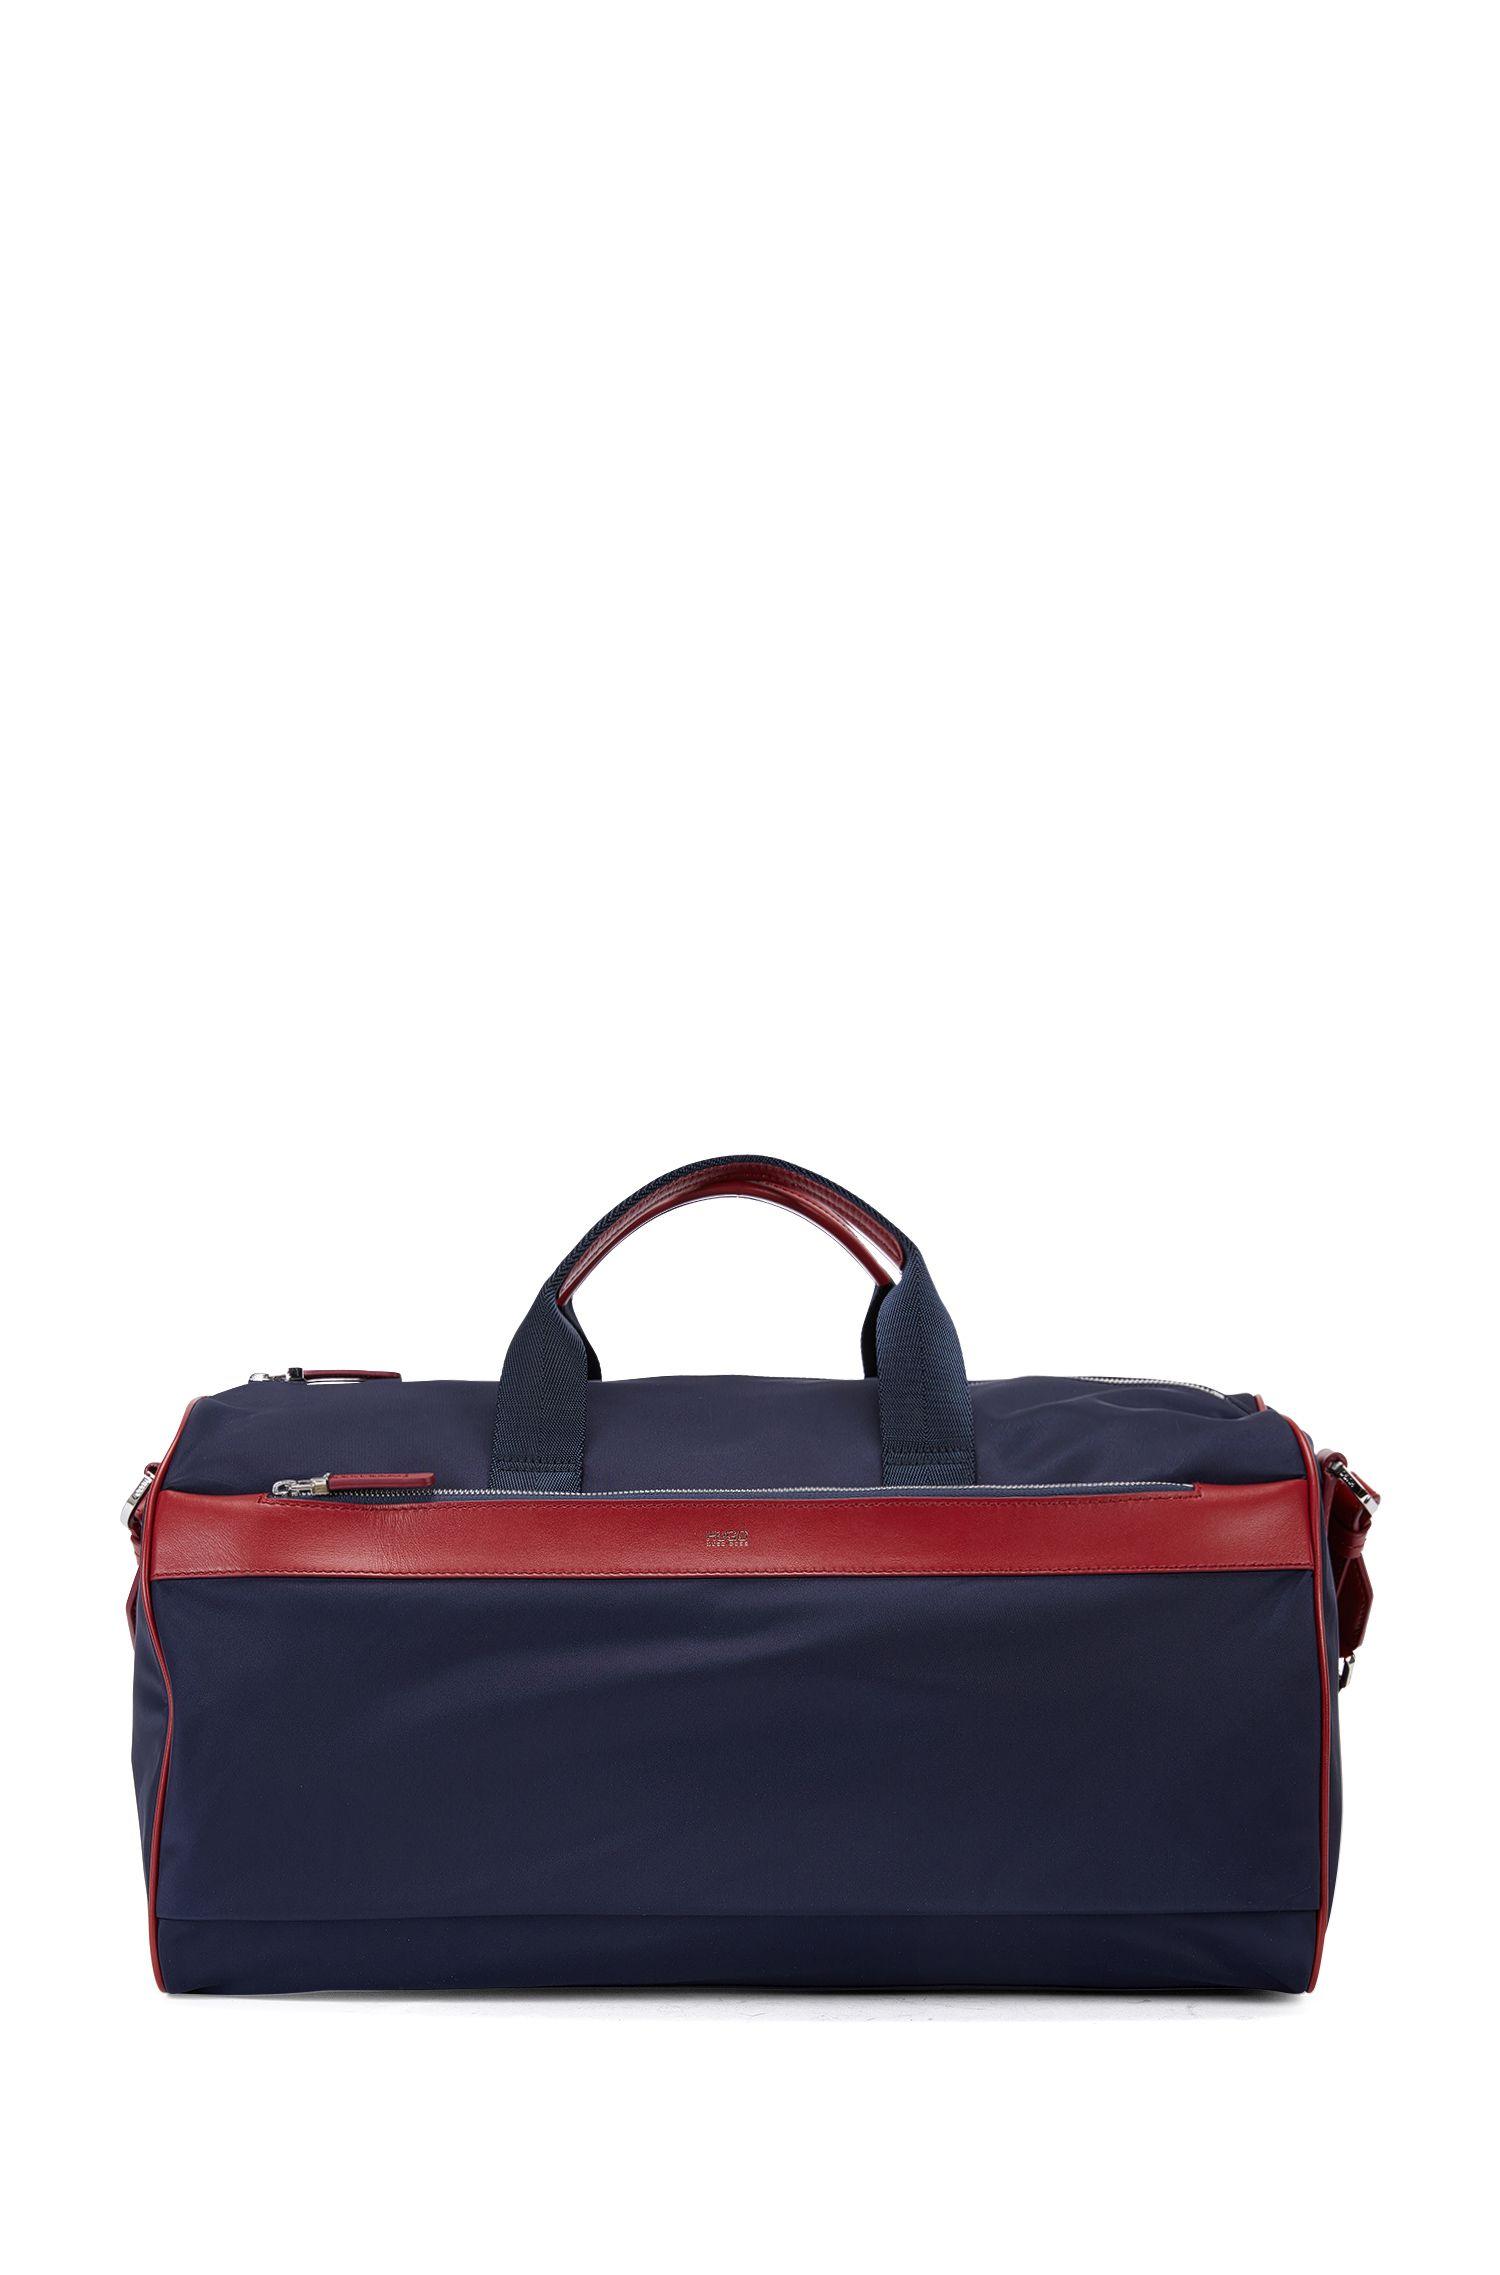 'Digital L Hold' | Nylon Weekender Bag